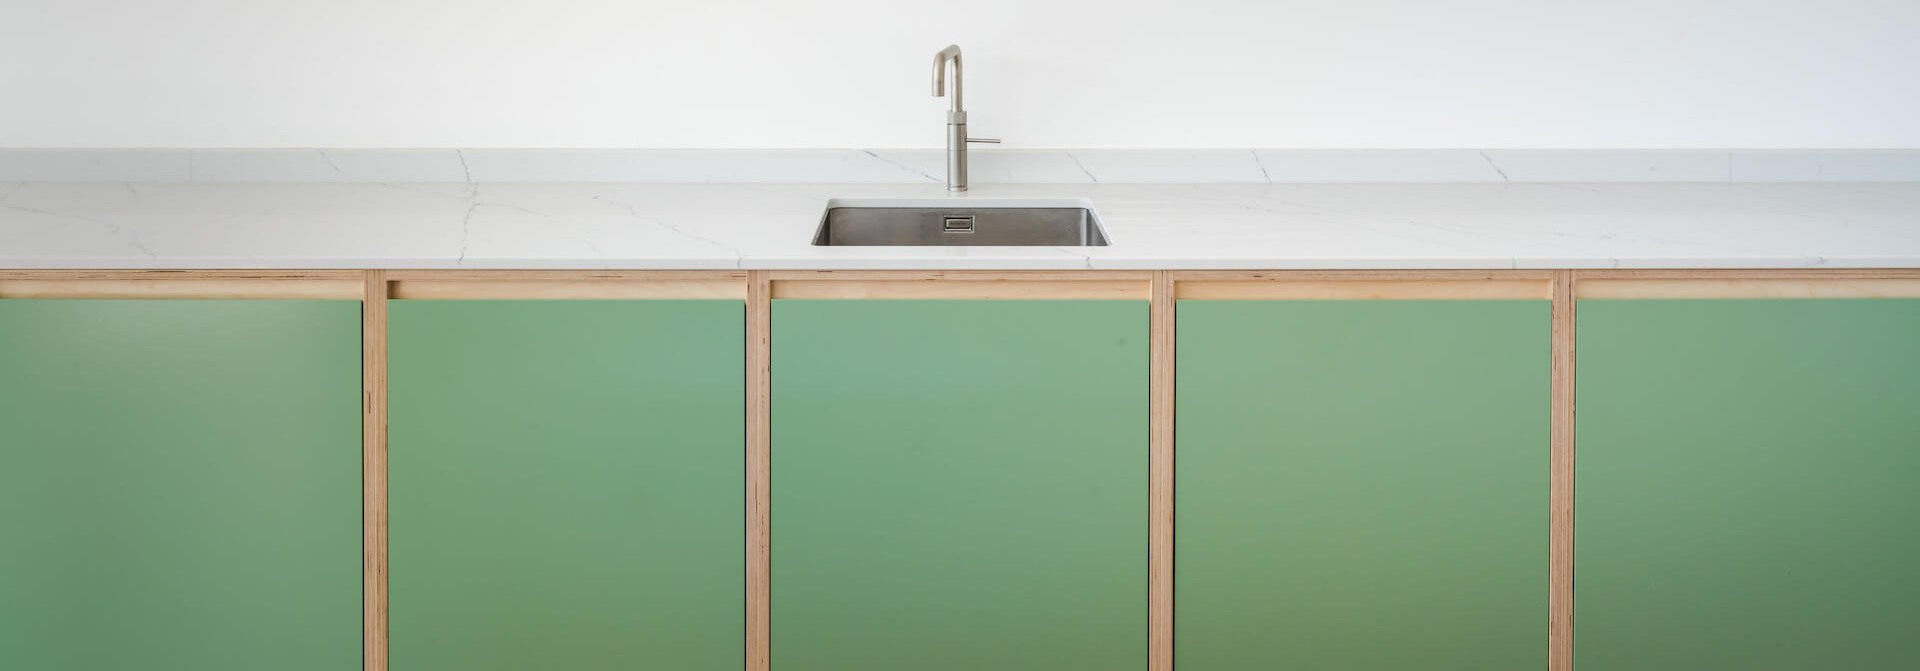 Minimalist Green Shaker Kitchen